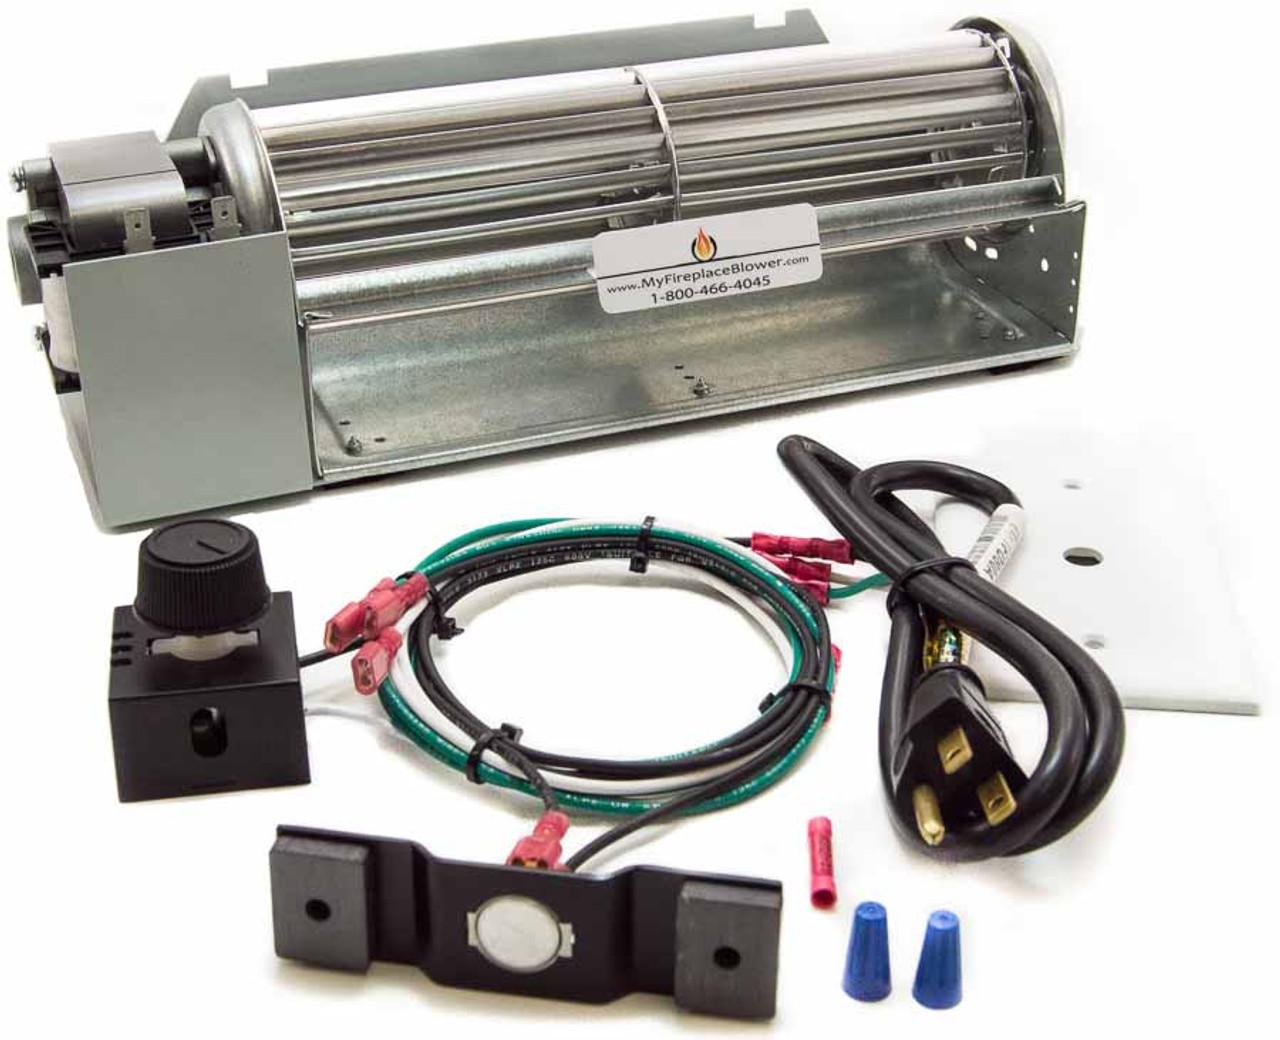 hight resolution of fireplace insert fan motor wiring diagram